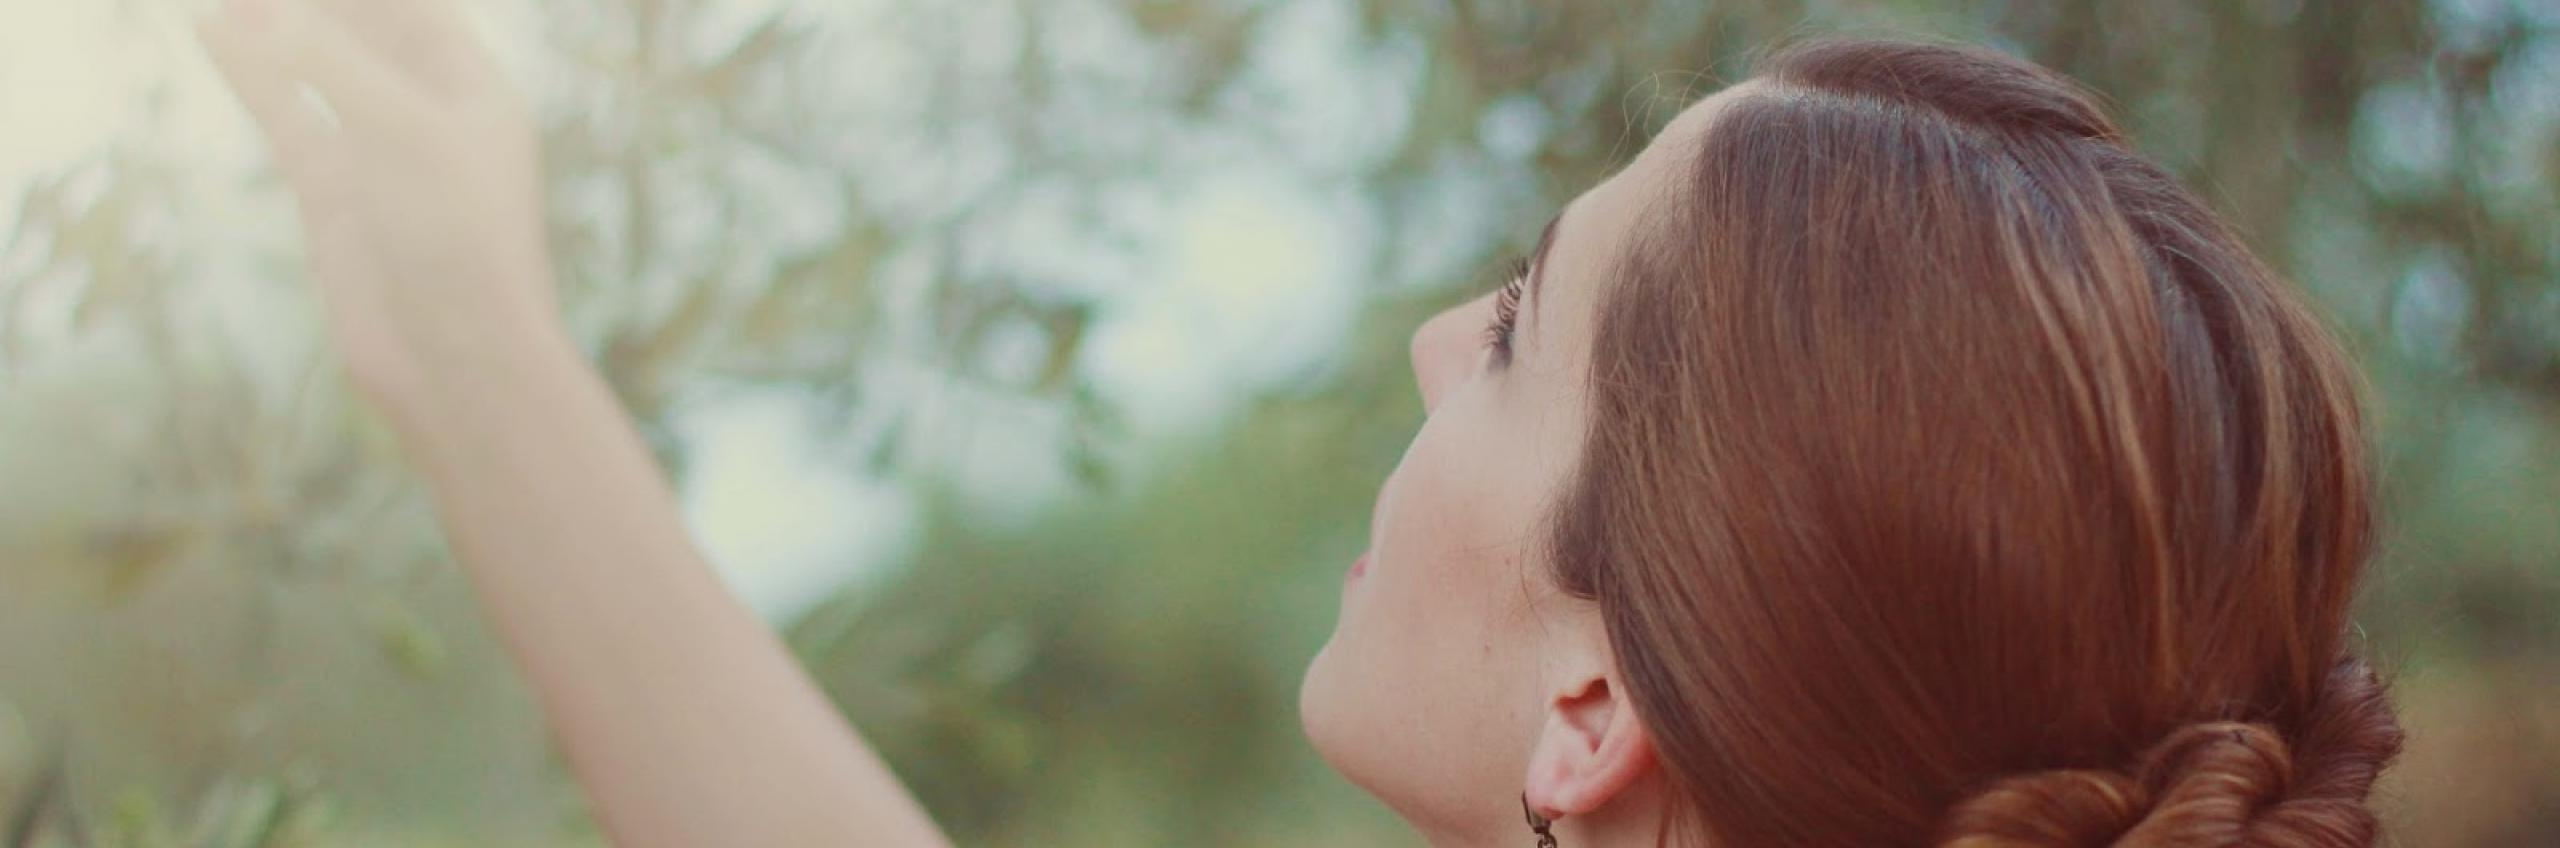 The best natural beauty secrets of Croatian women ...